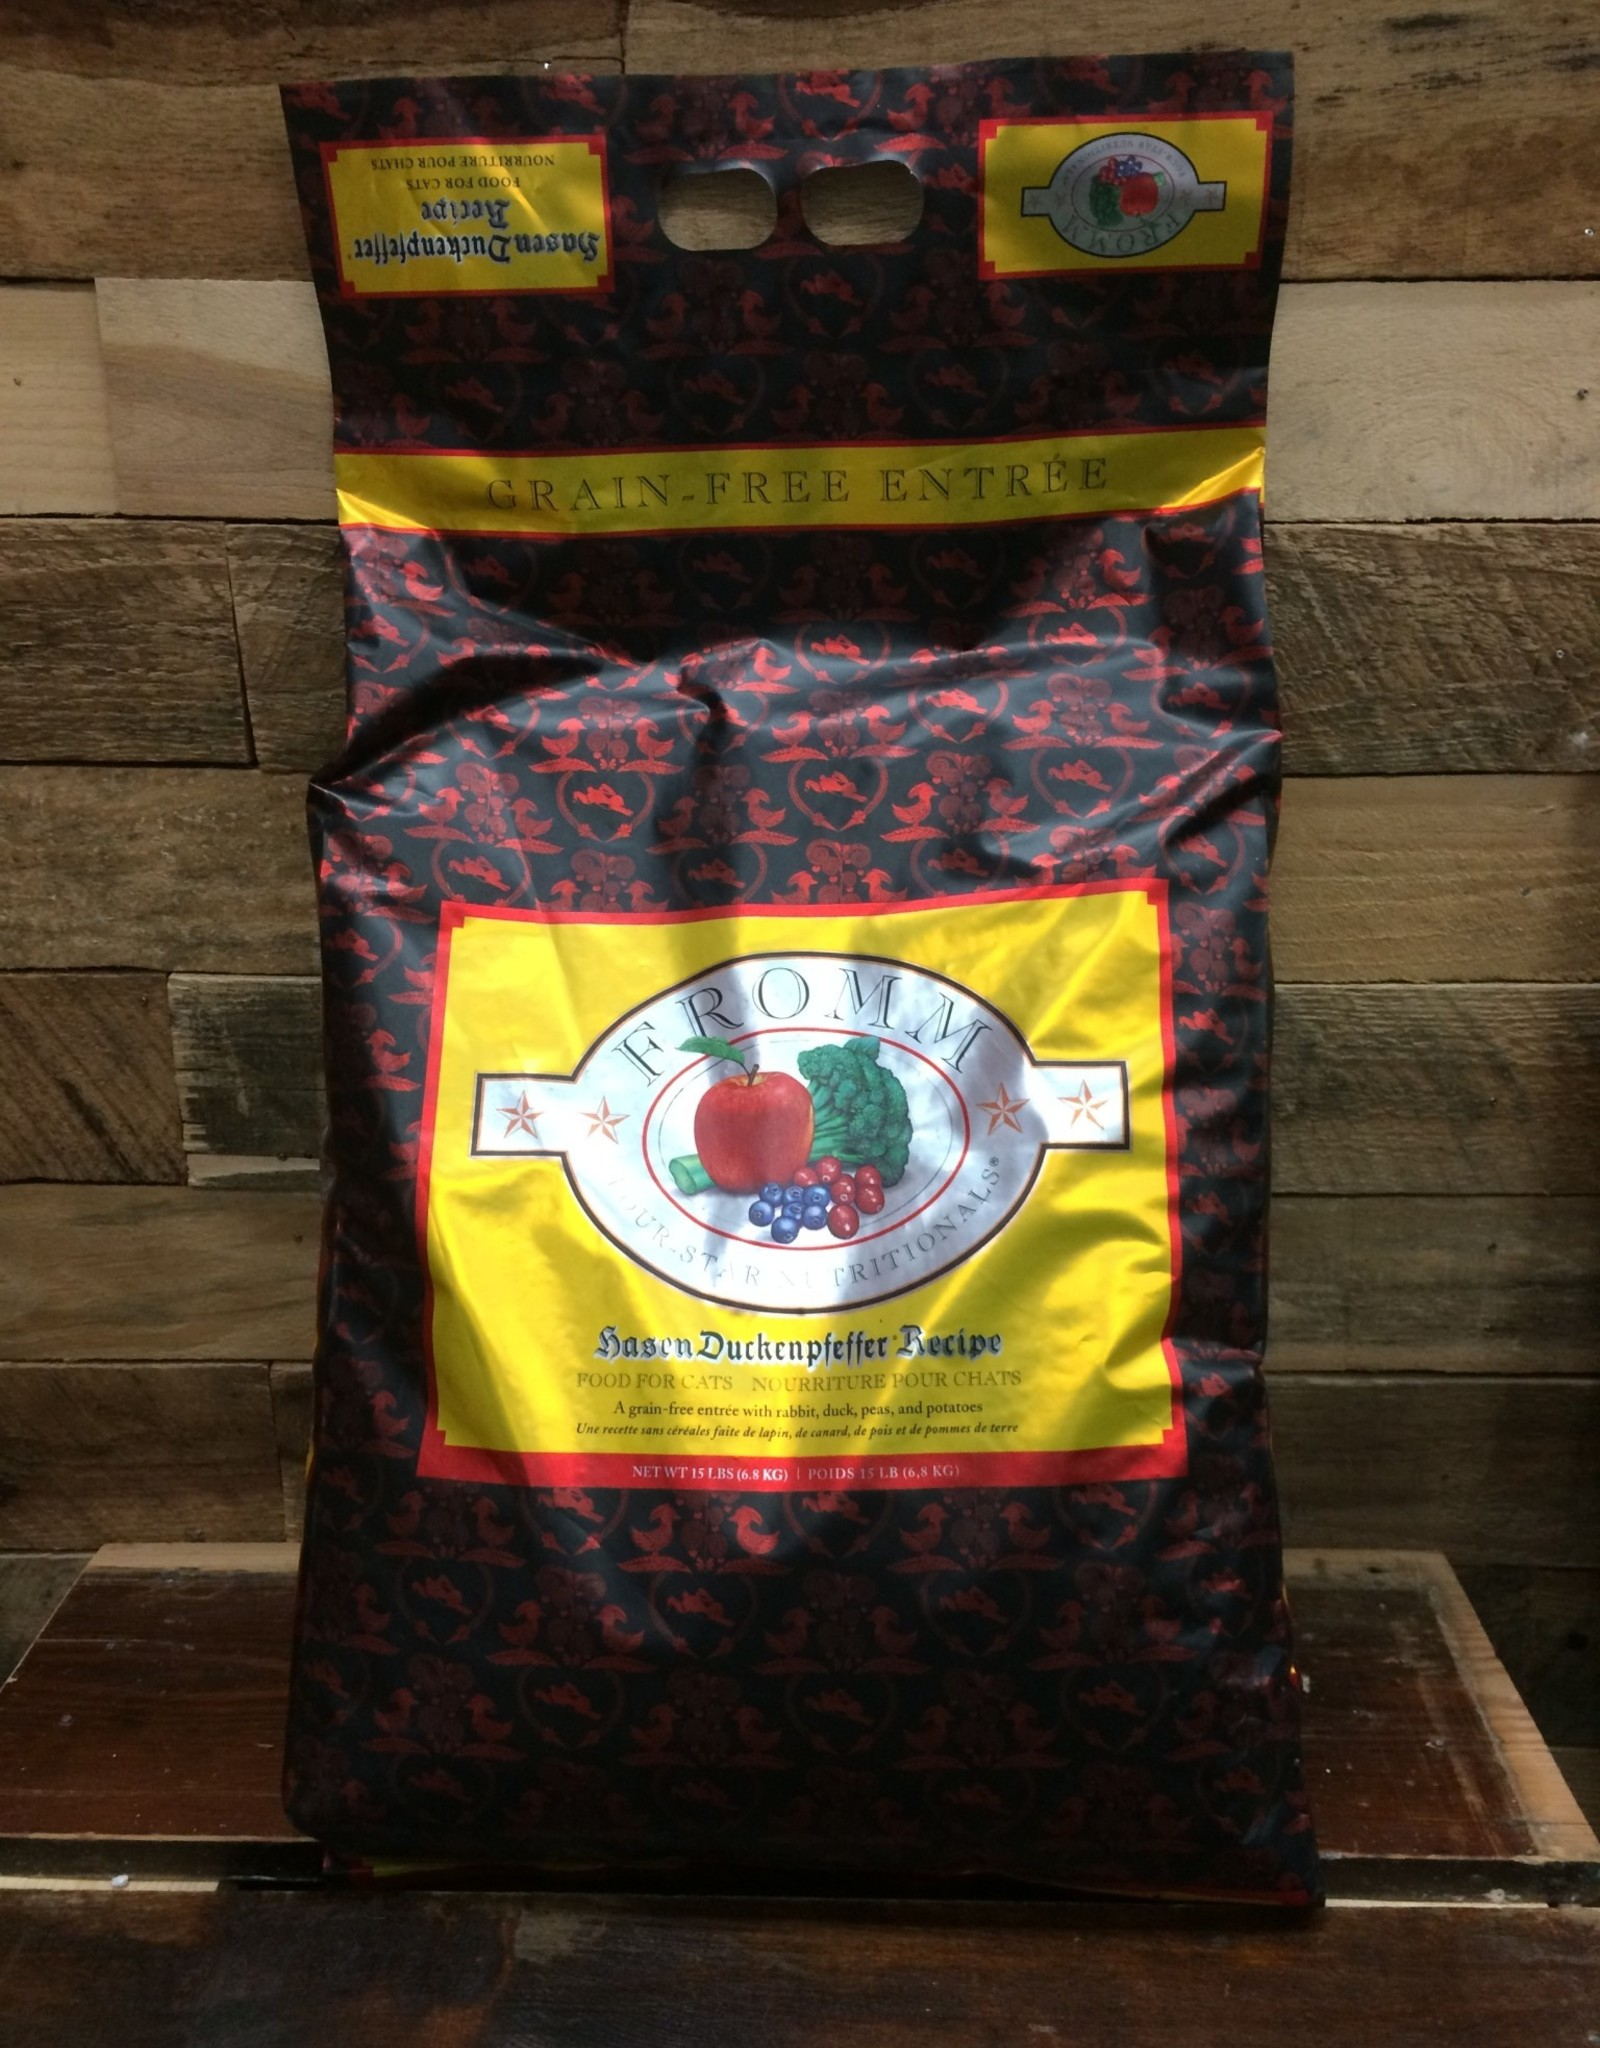 Fromm Family Foods Fromm GF 4STAR Hasen Duckenpfeffer cat 15#